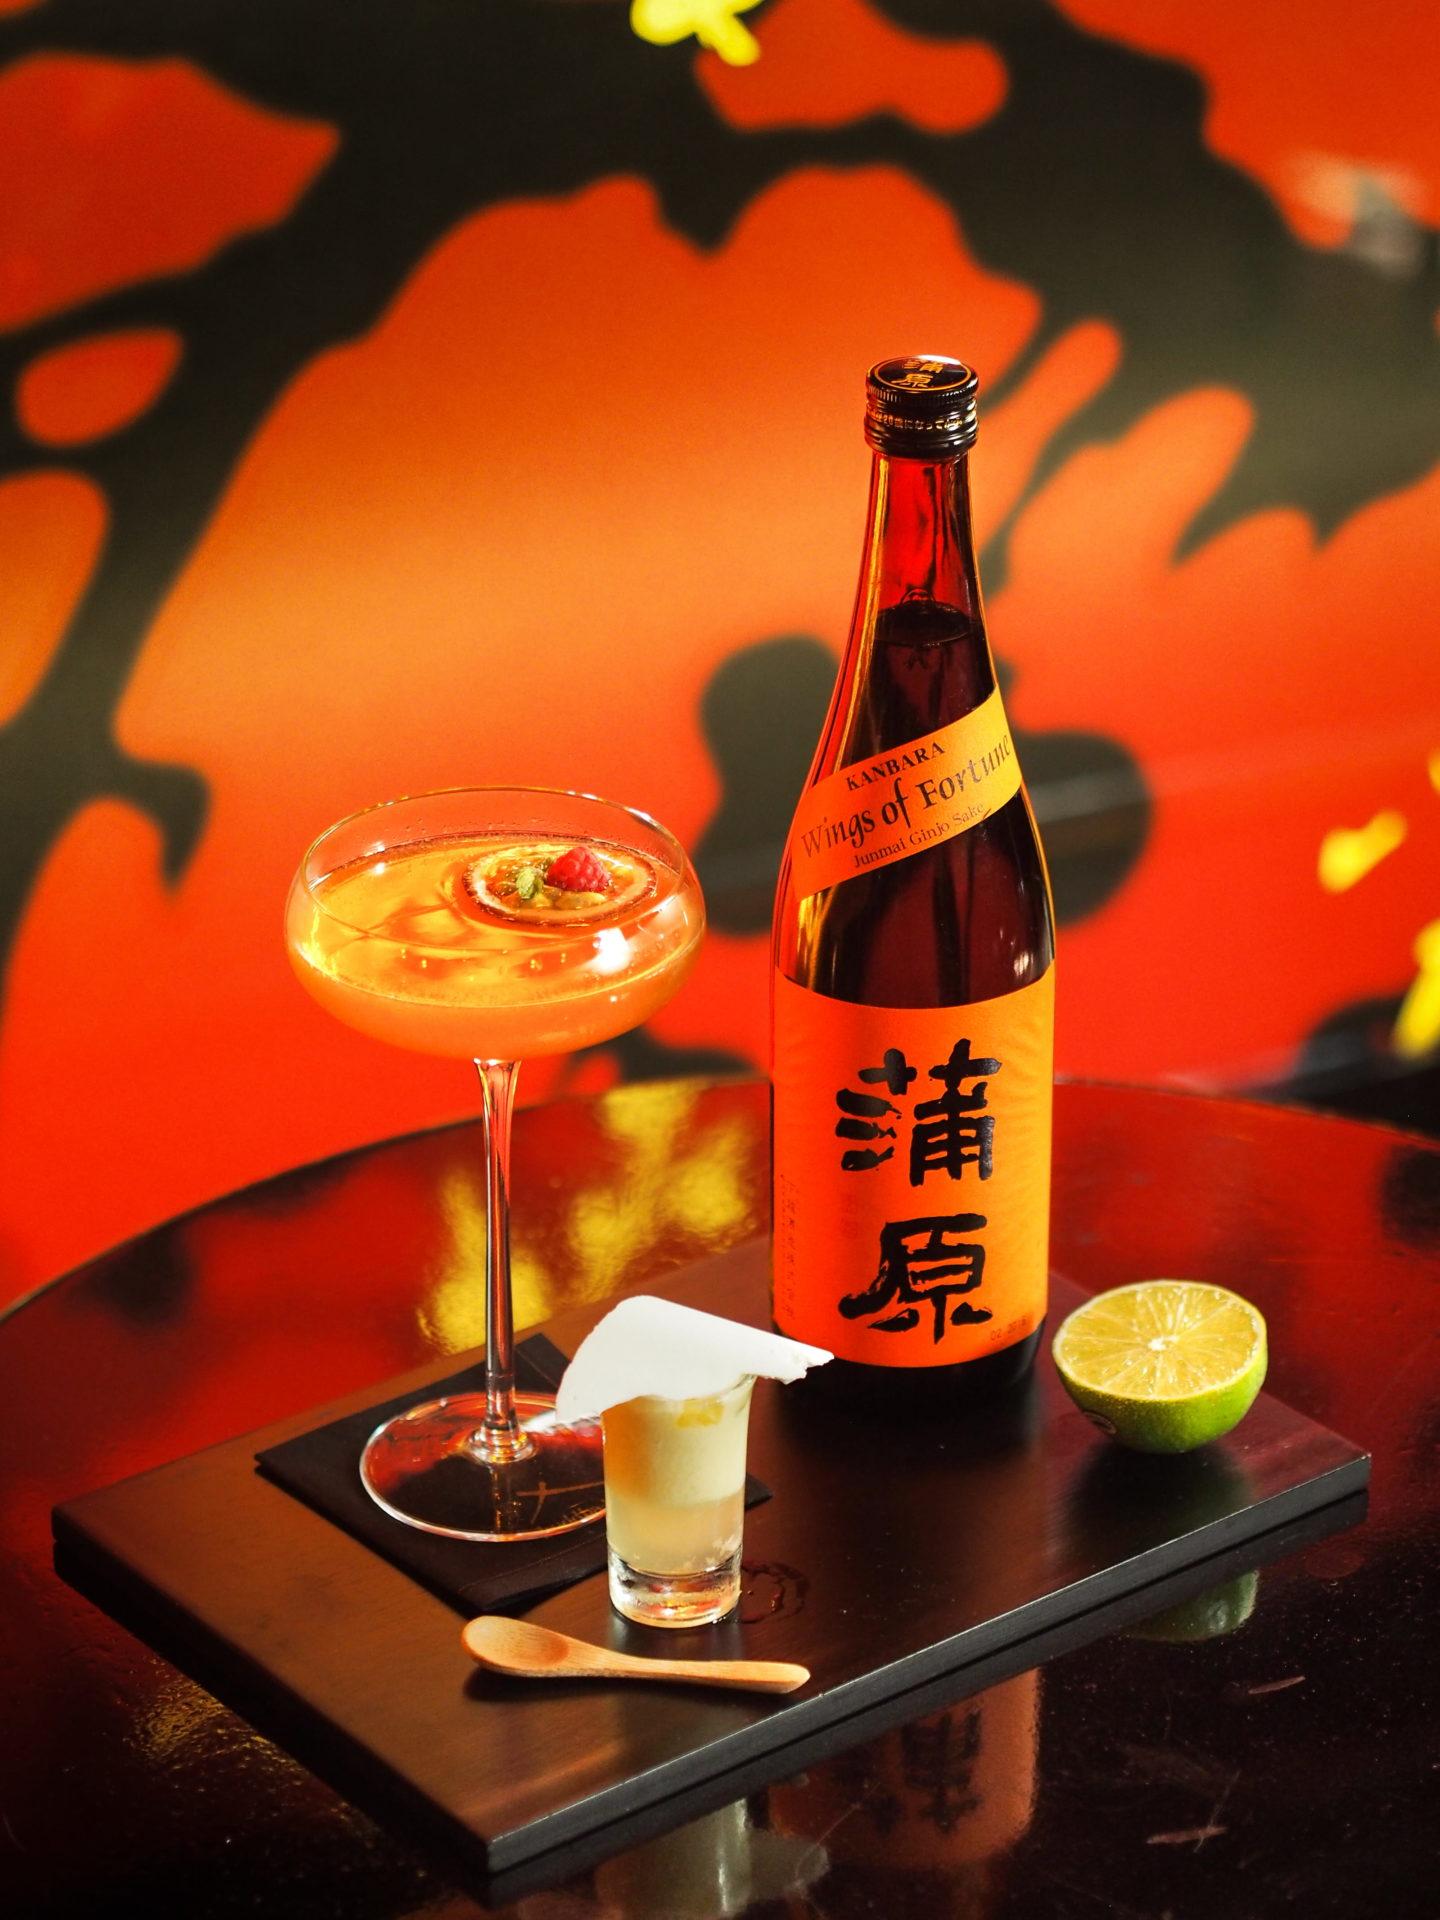 La maison de saké KAETSU SHUZO